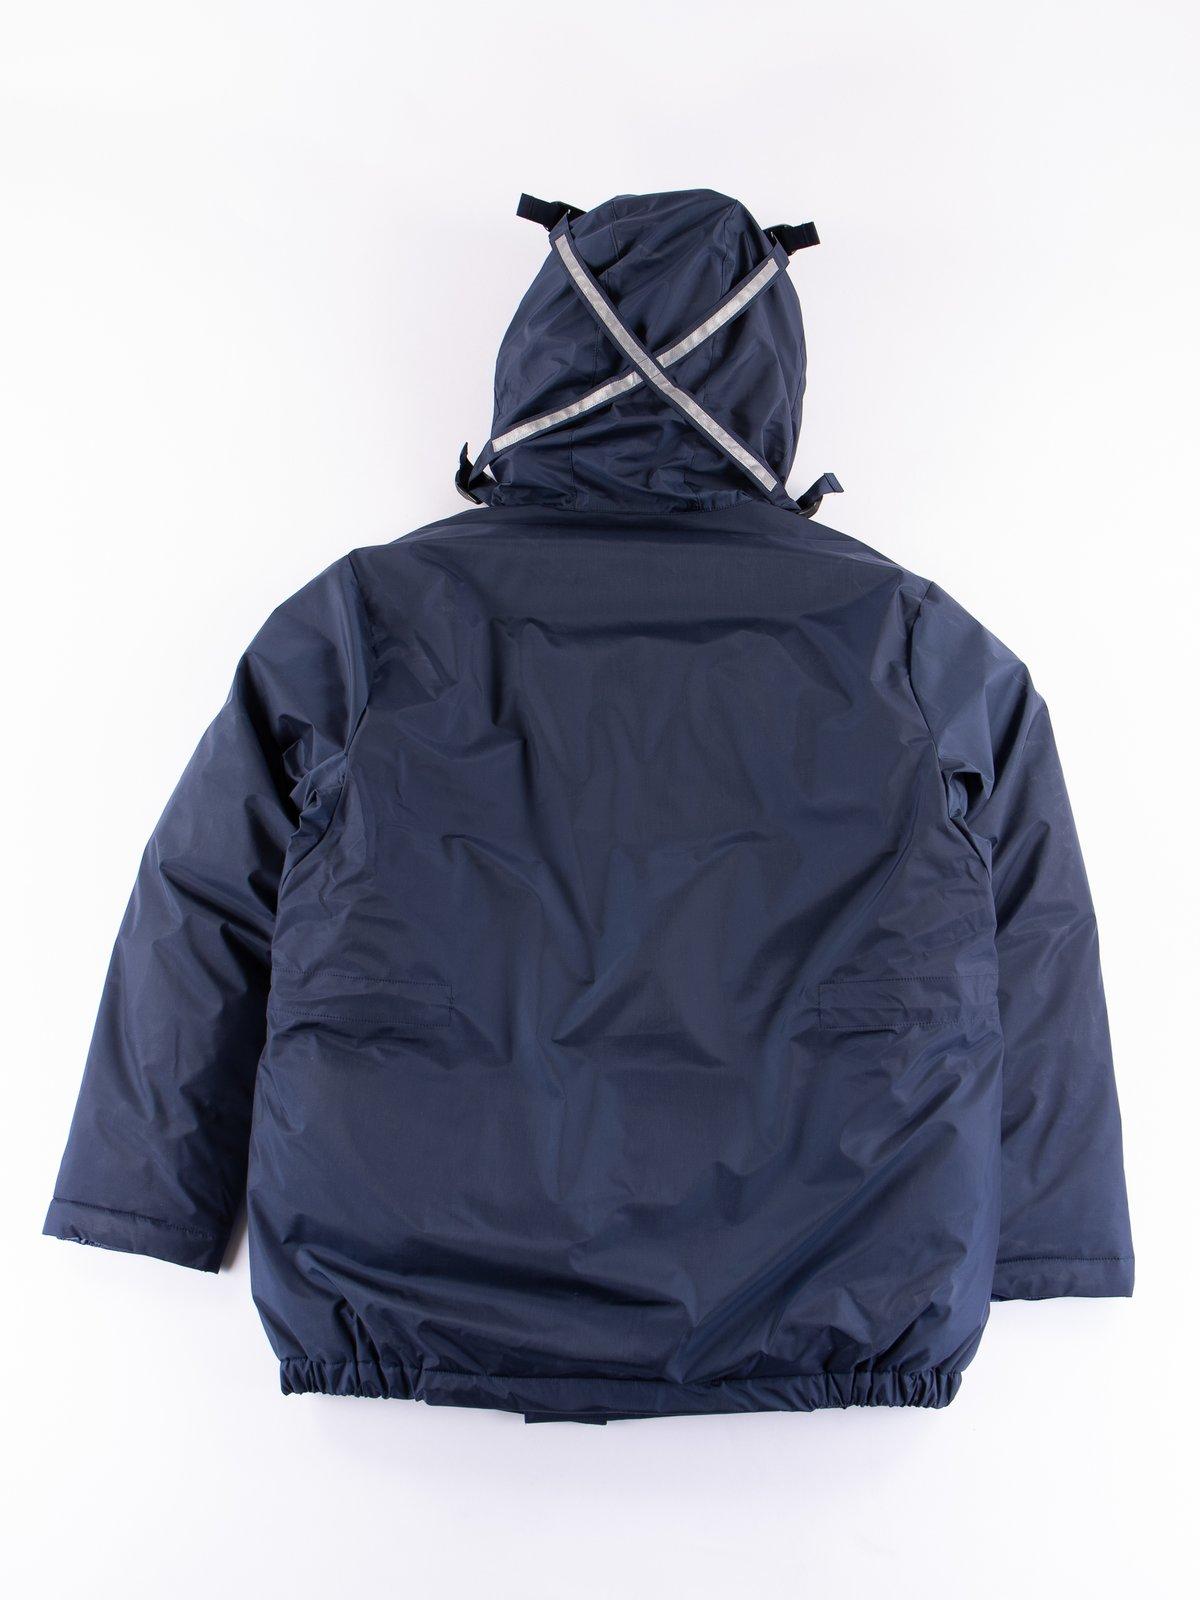 Navy/Blue Arktikal Down Jacket - Image 8